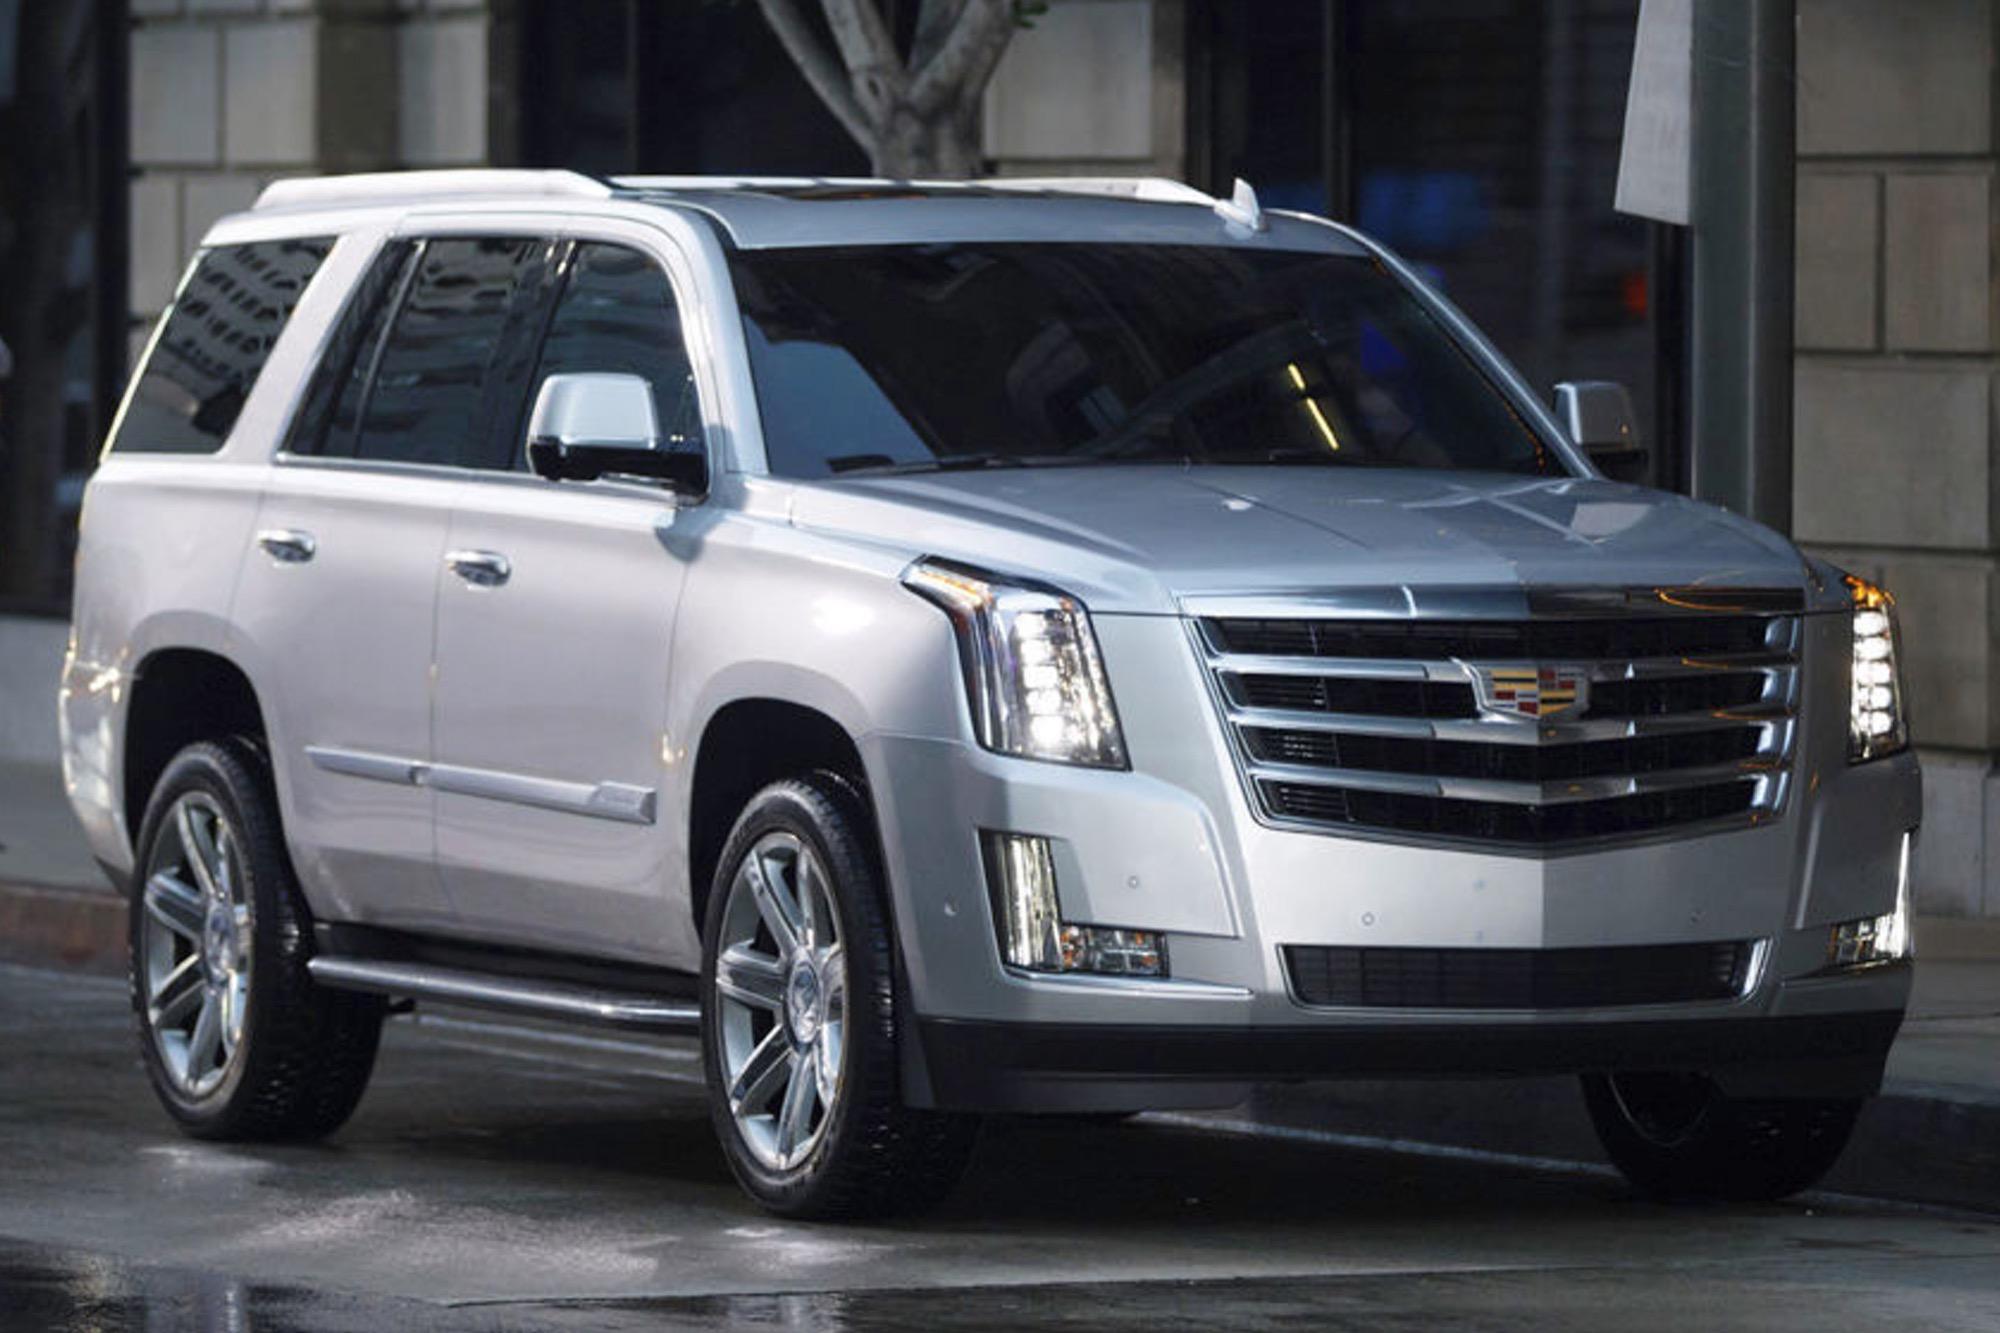 Cadillac Escalade Sales Results - Second Quarter 2018